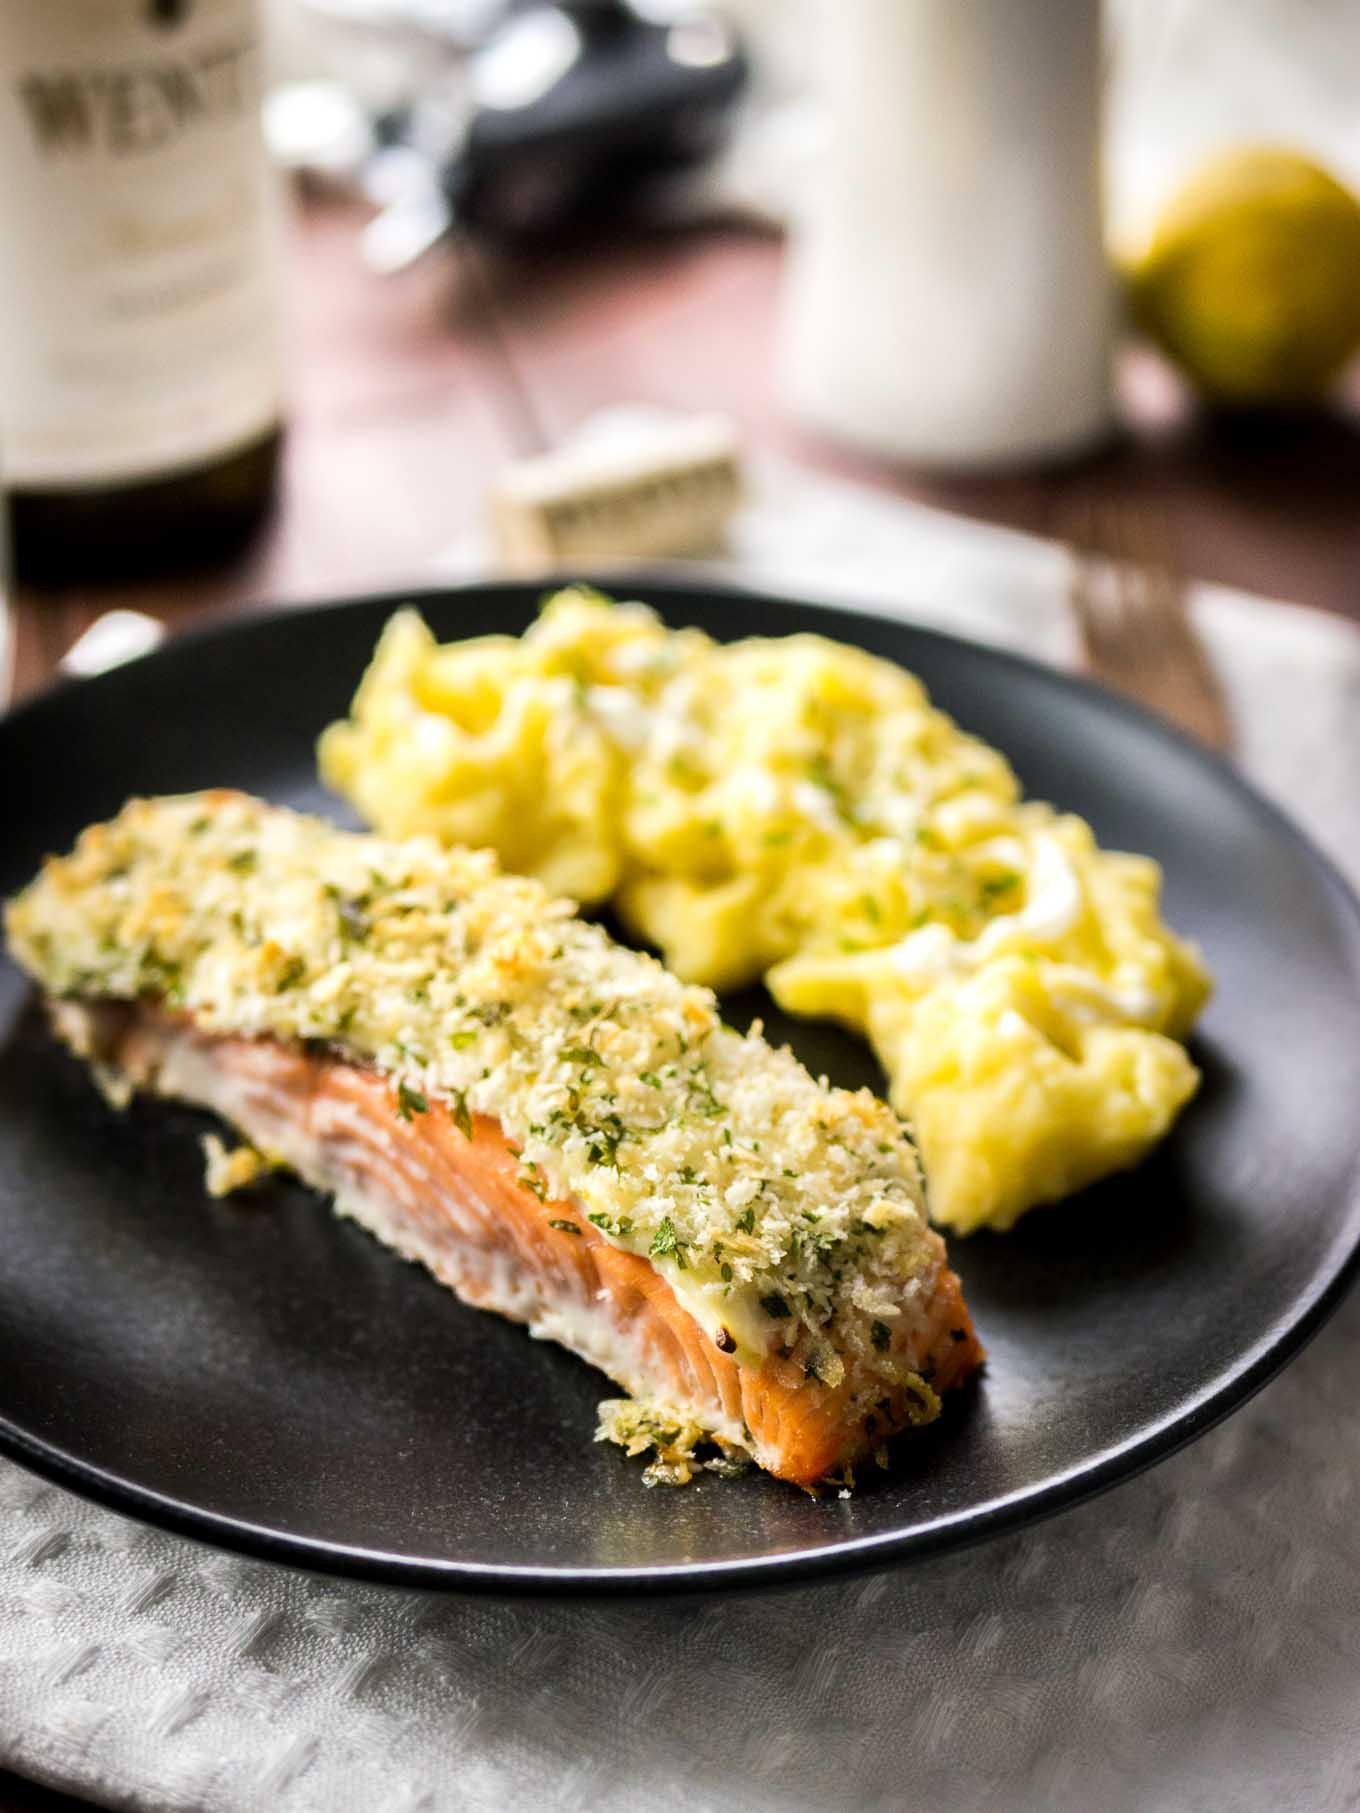 Horseradish Parmesan Crusted Salmon Plated Cravings